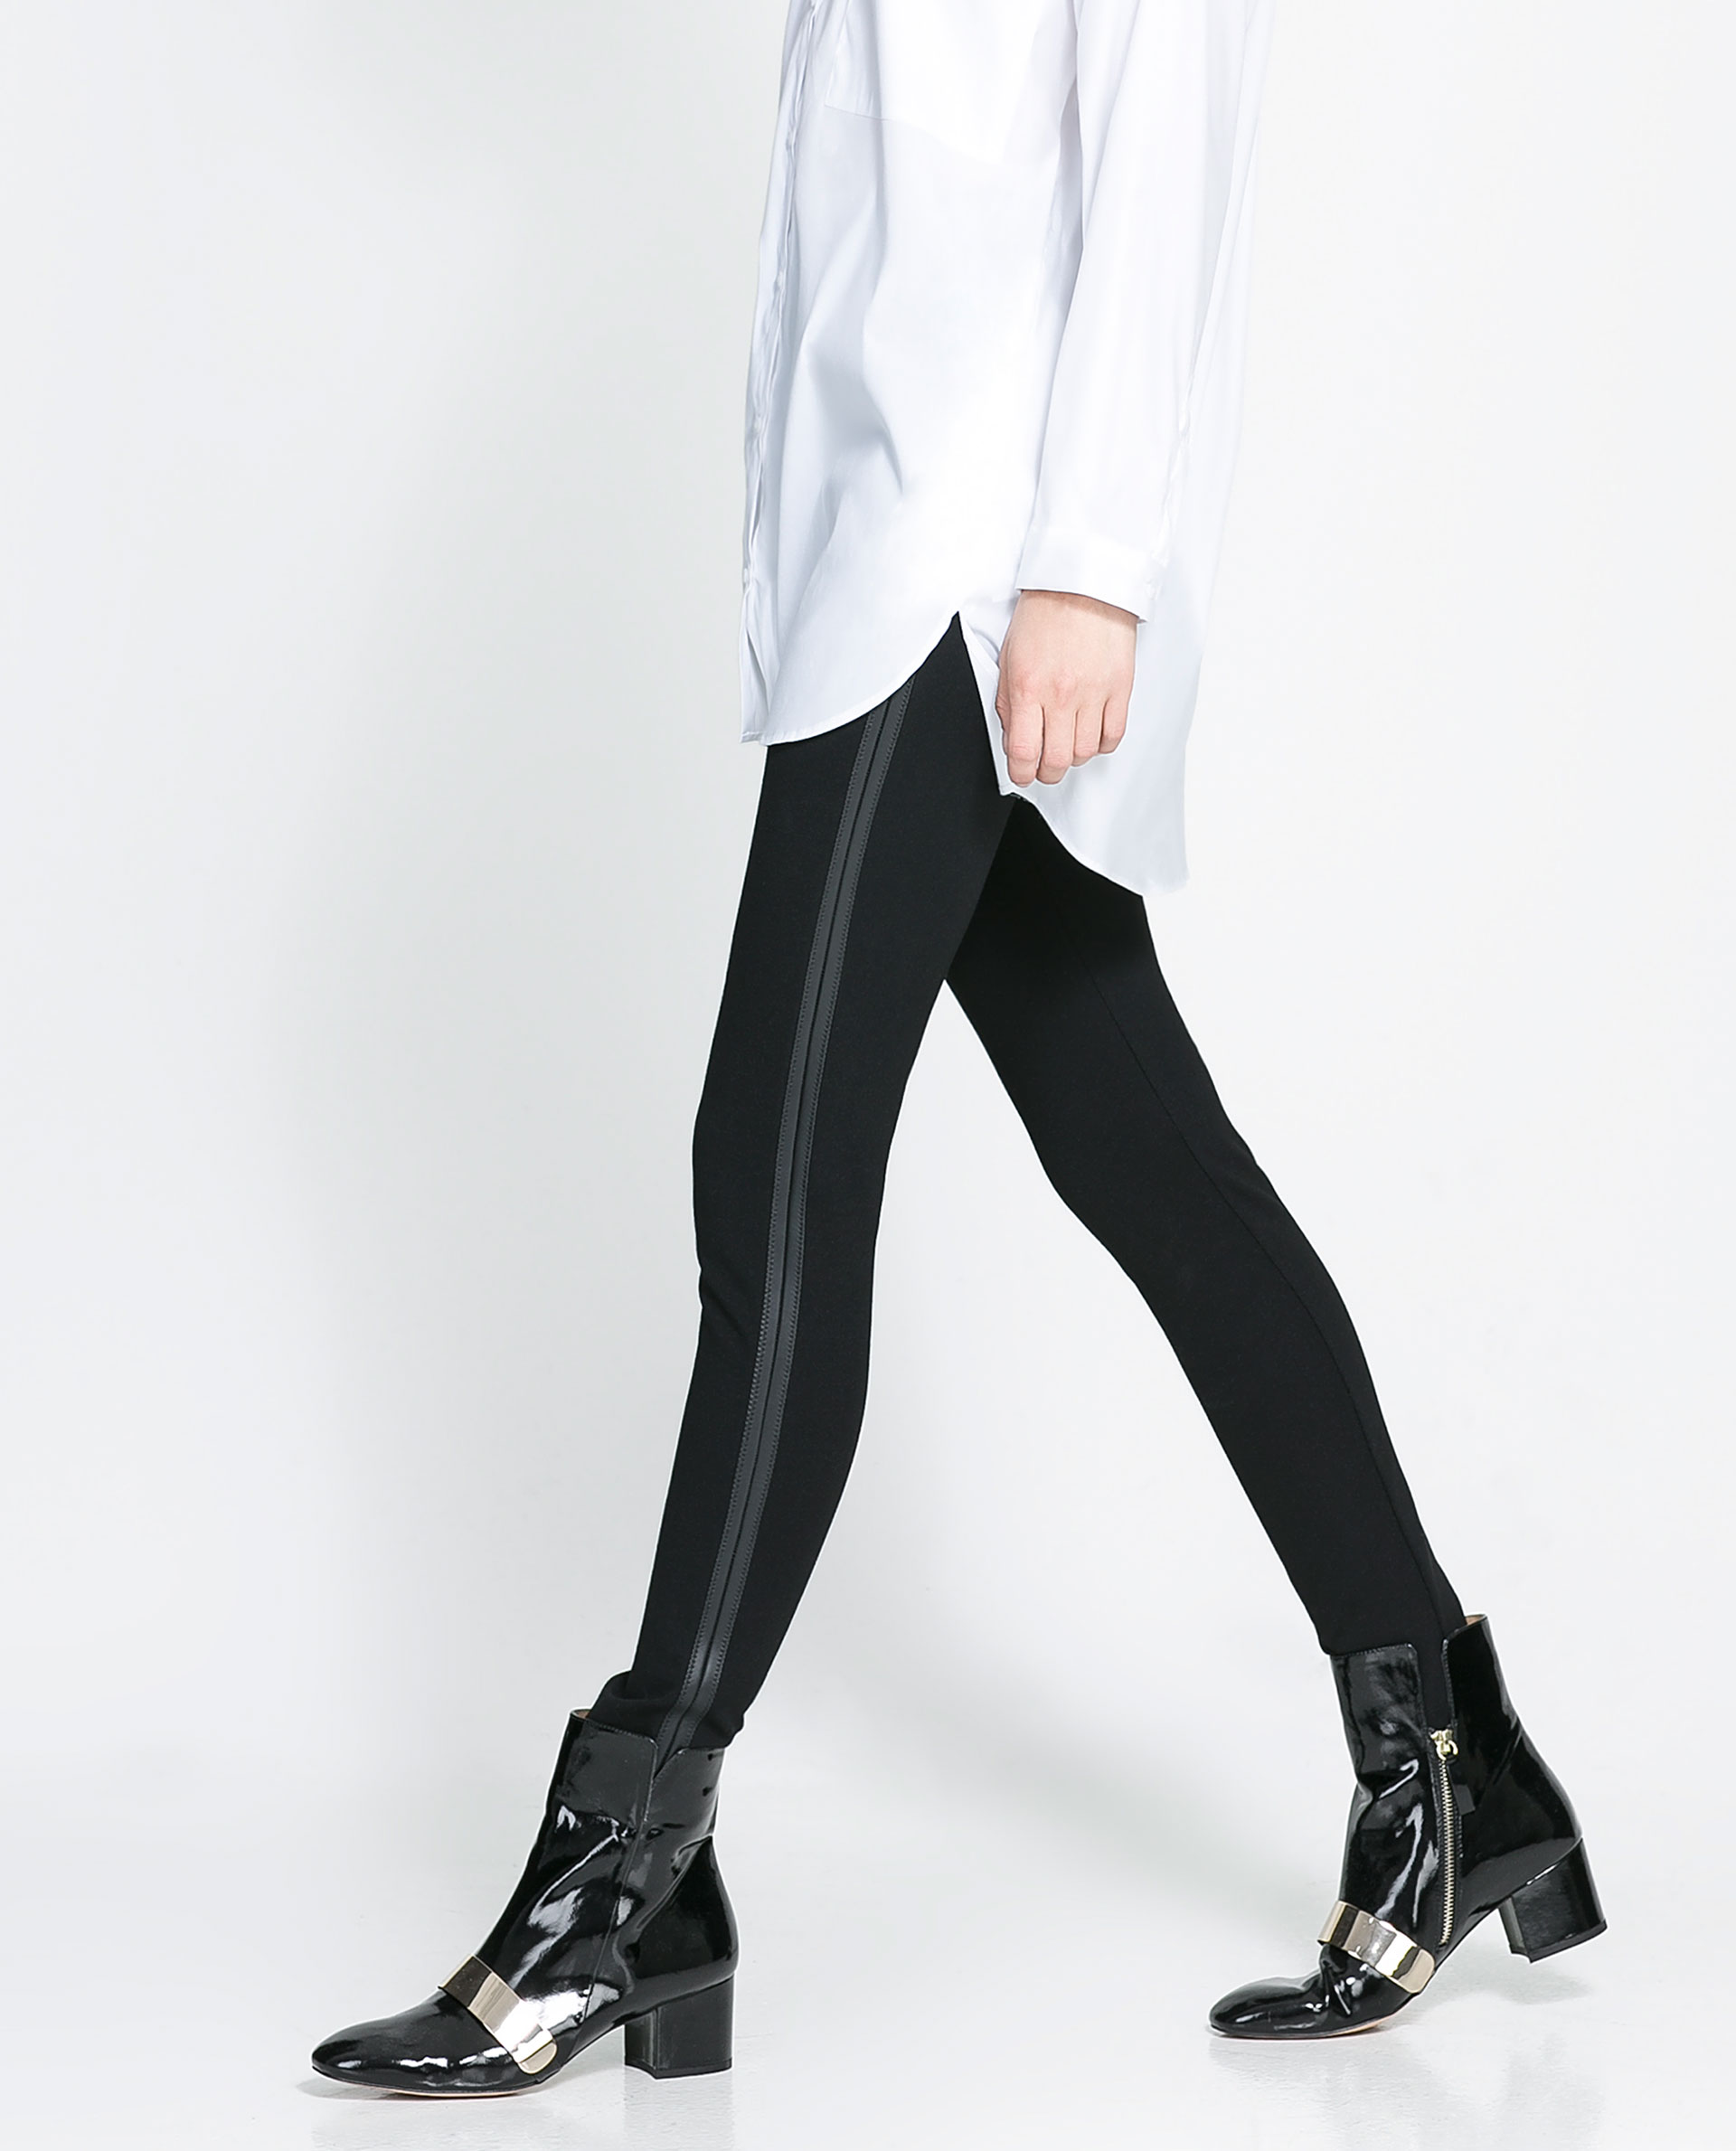 Creative Women39s Faux Leather Pants Women39s Black Leather Pants Women39s Le